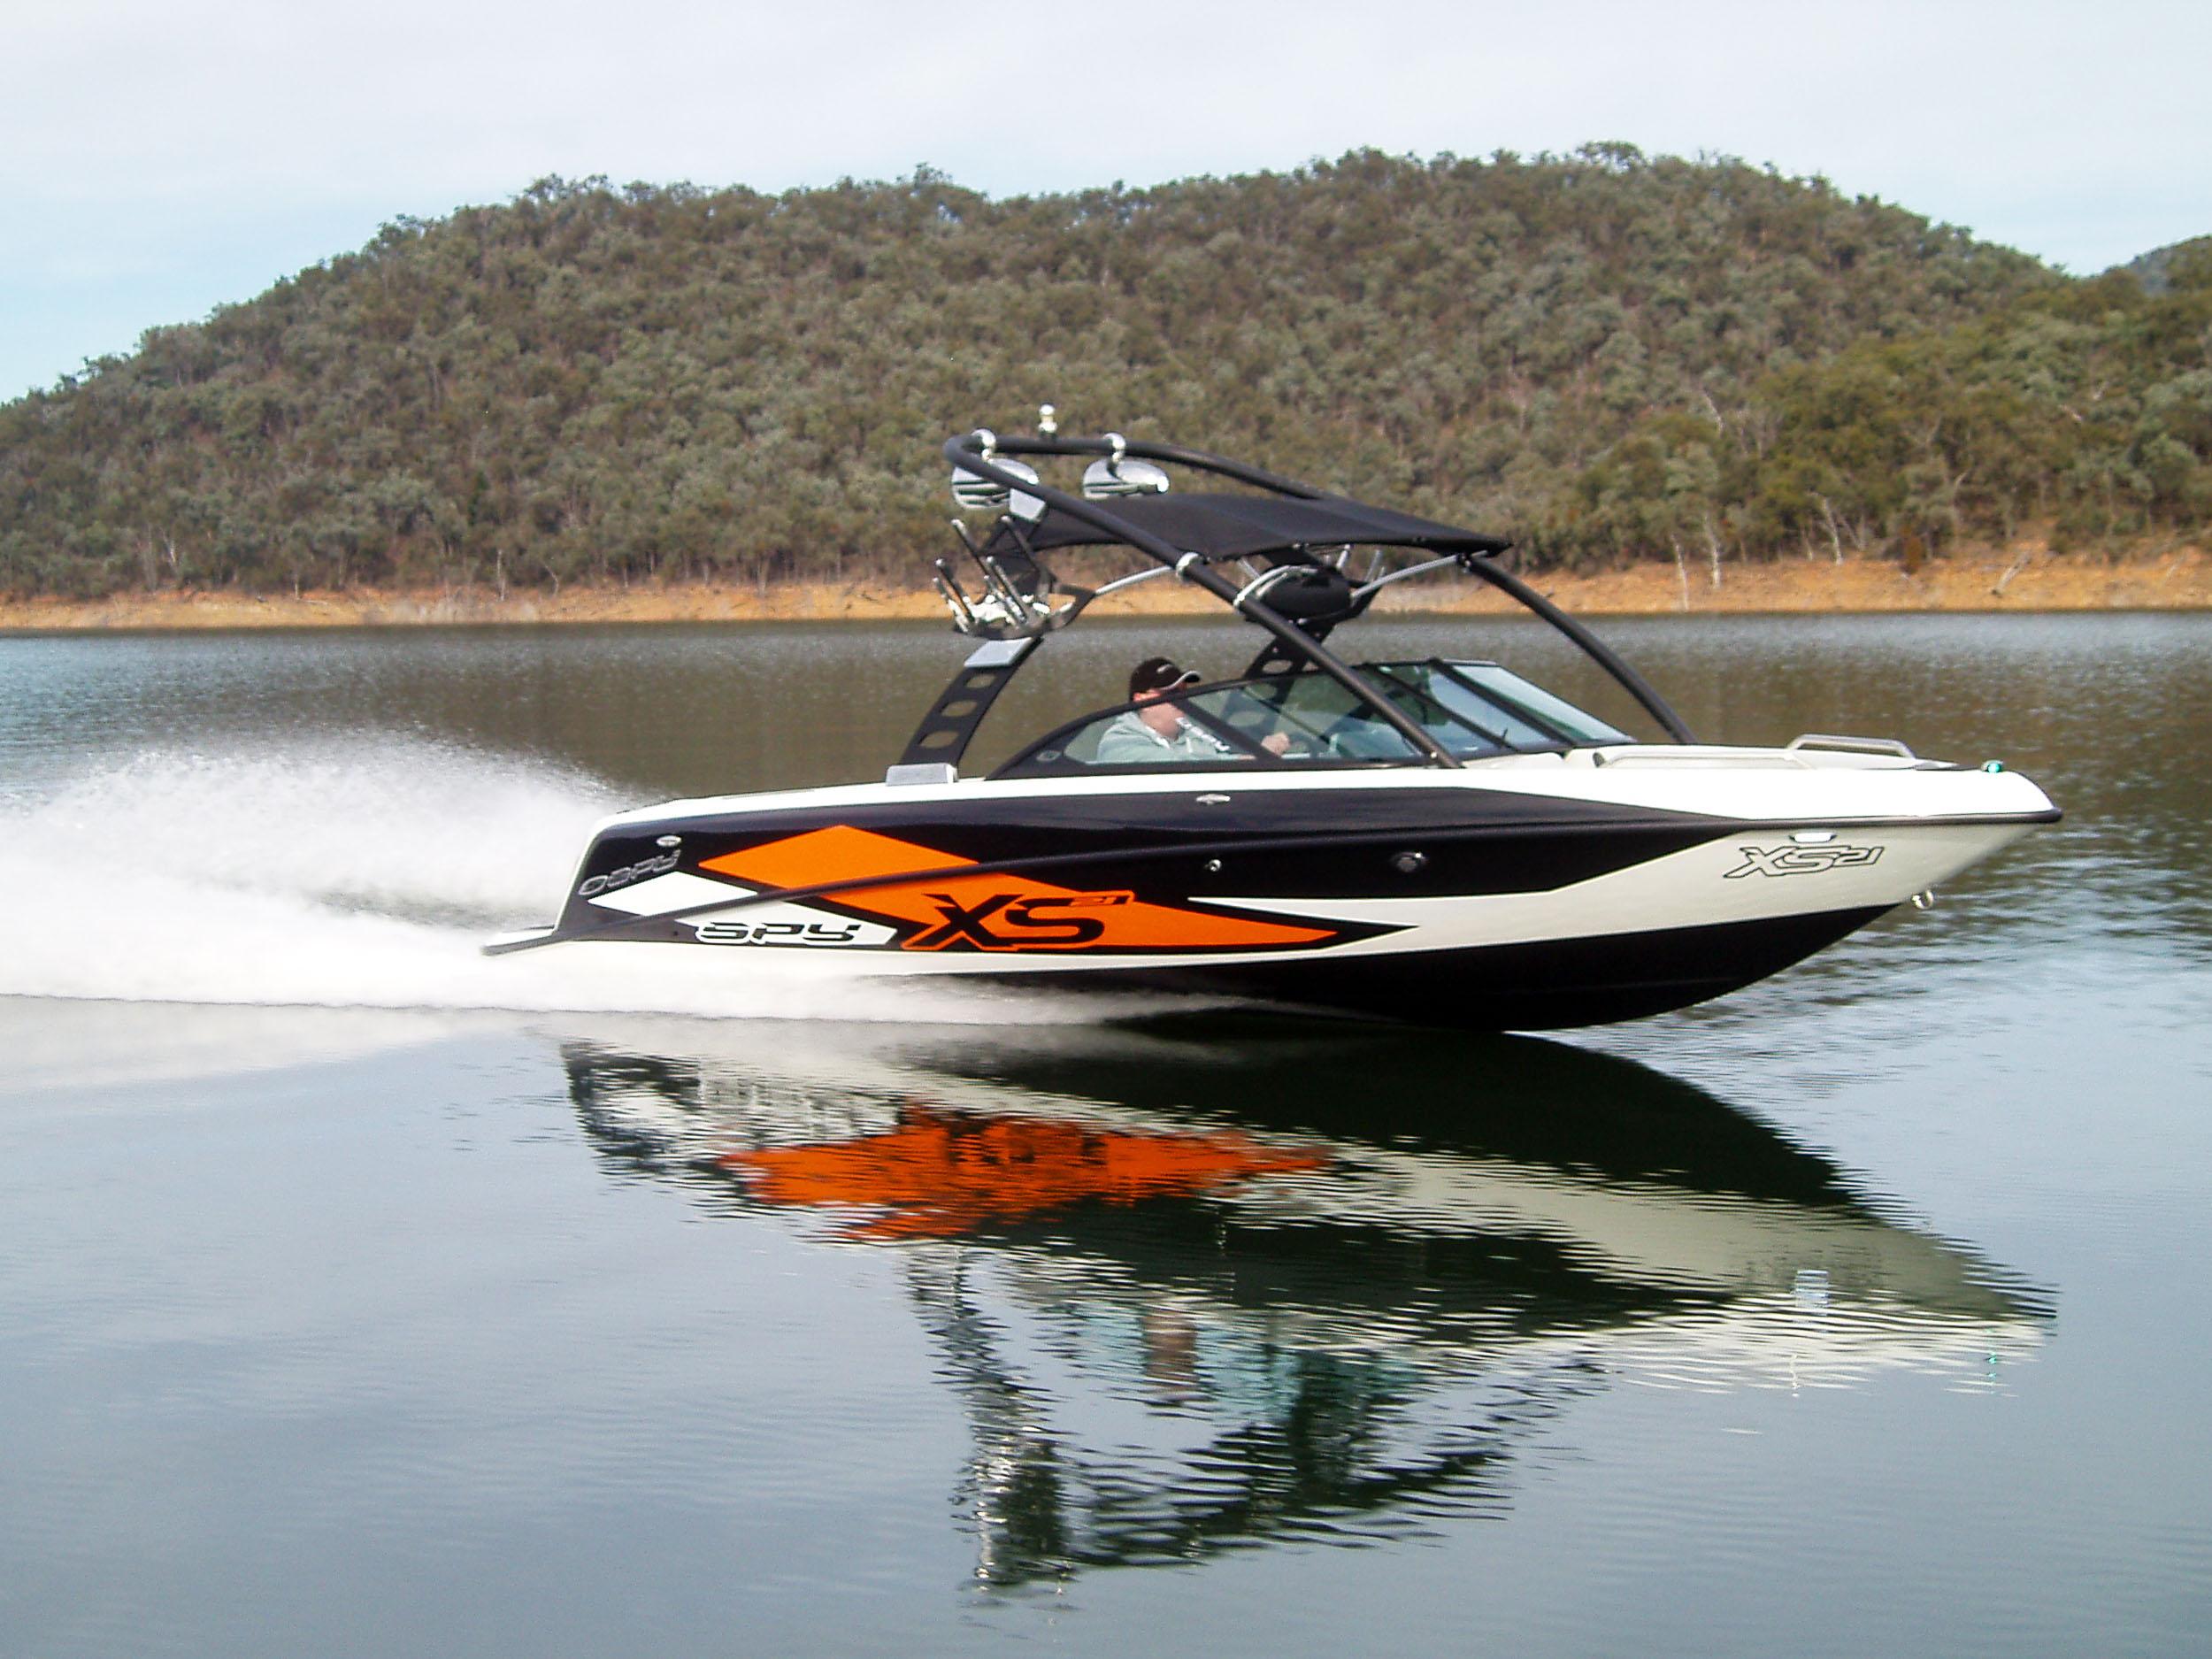 Spy_Boats_XS21-6.jpg